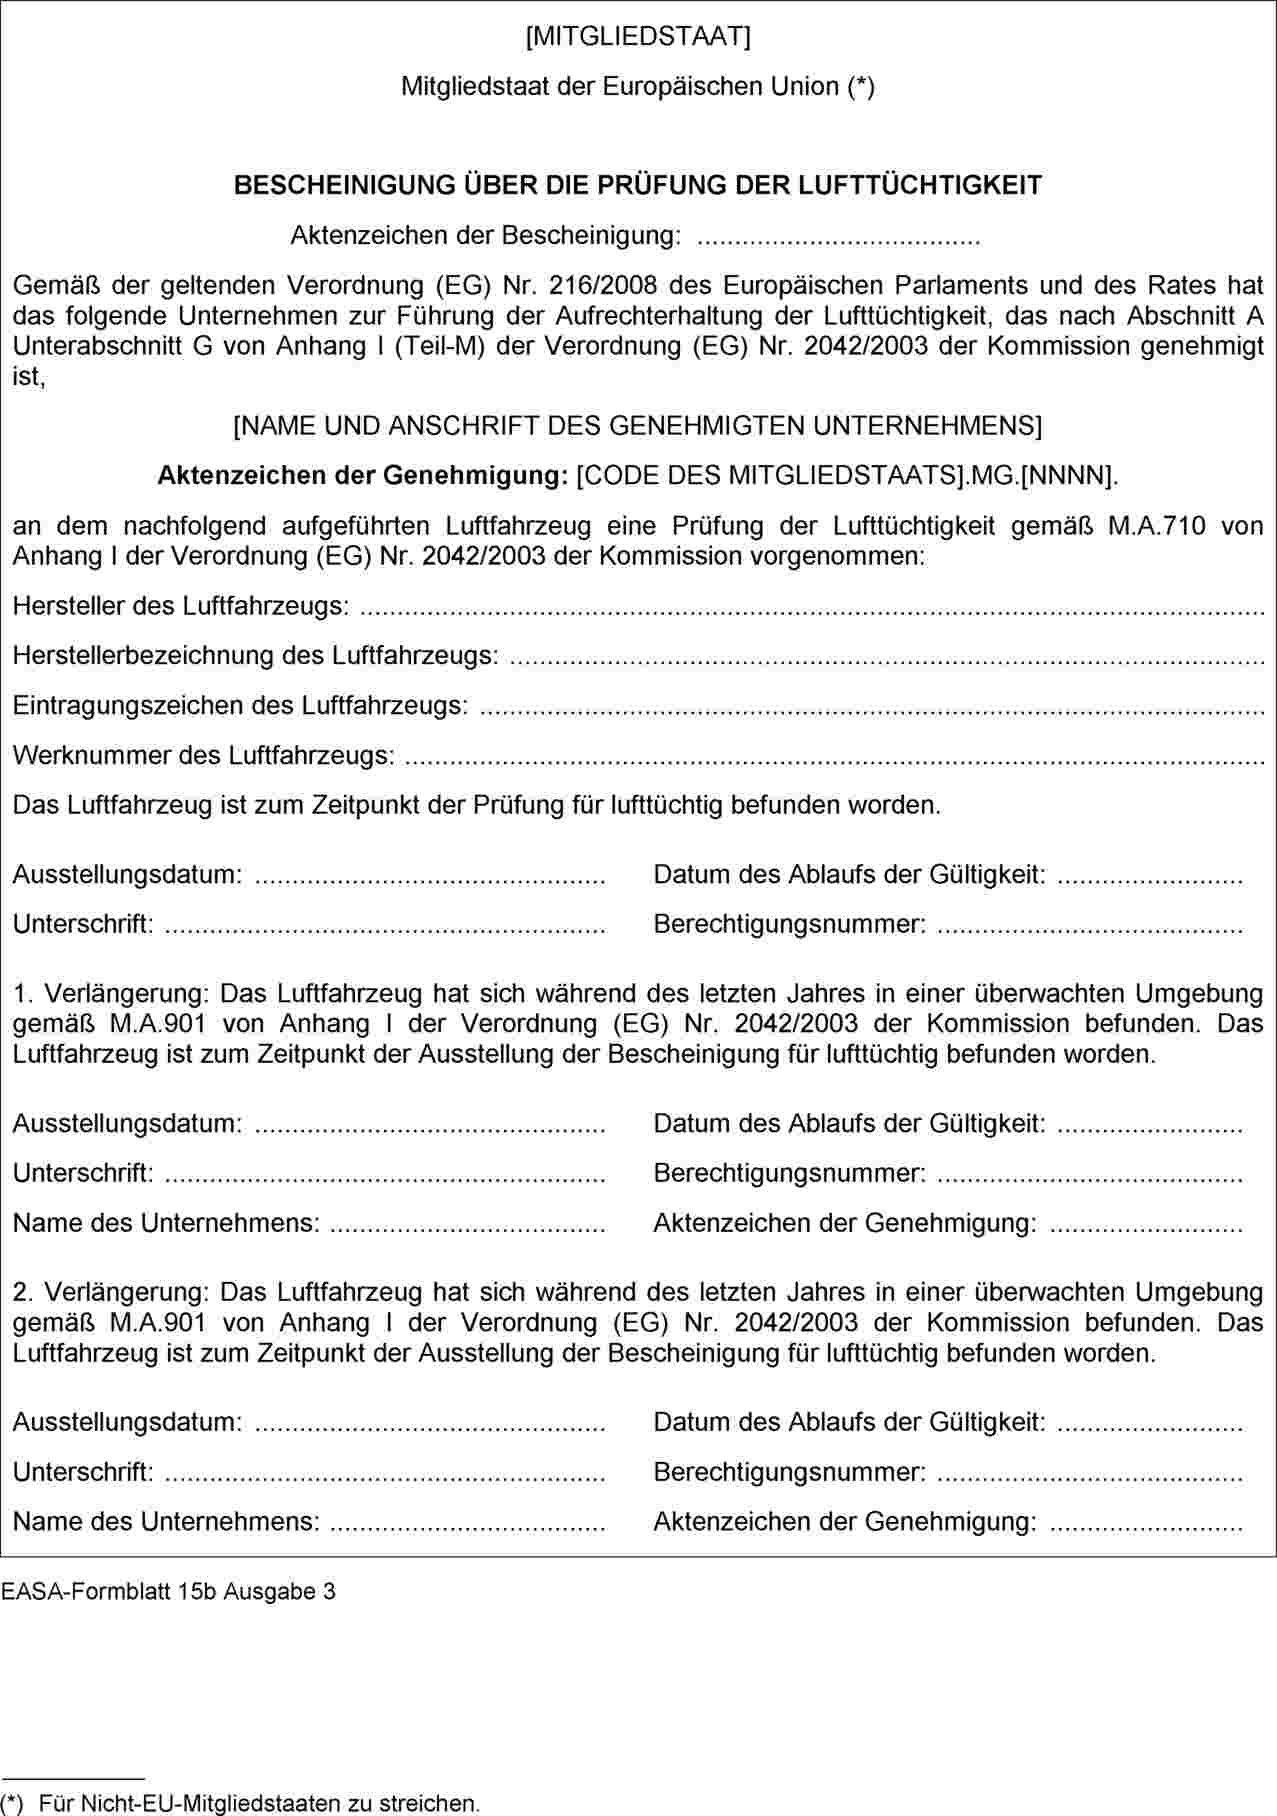 EUR-Lex - 32014R1321 - EN - EUR-Lex